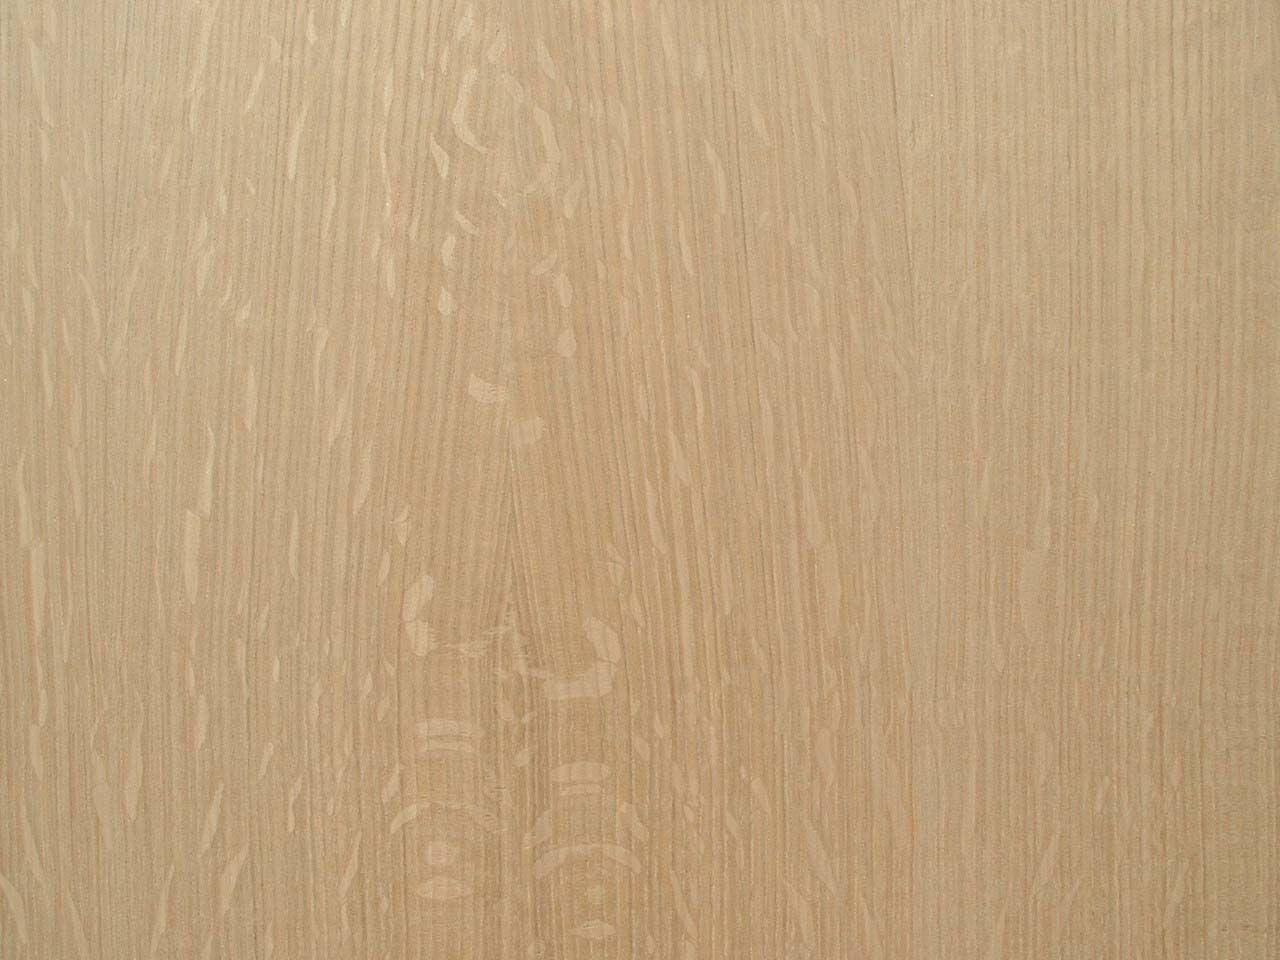 Quarter Sawn White Oak Veneer Plywood Grain Pattern Uob